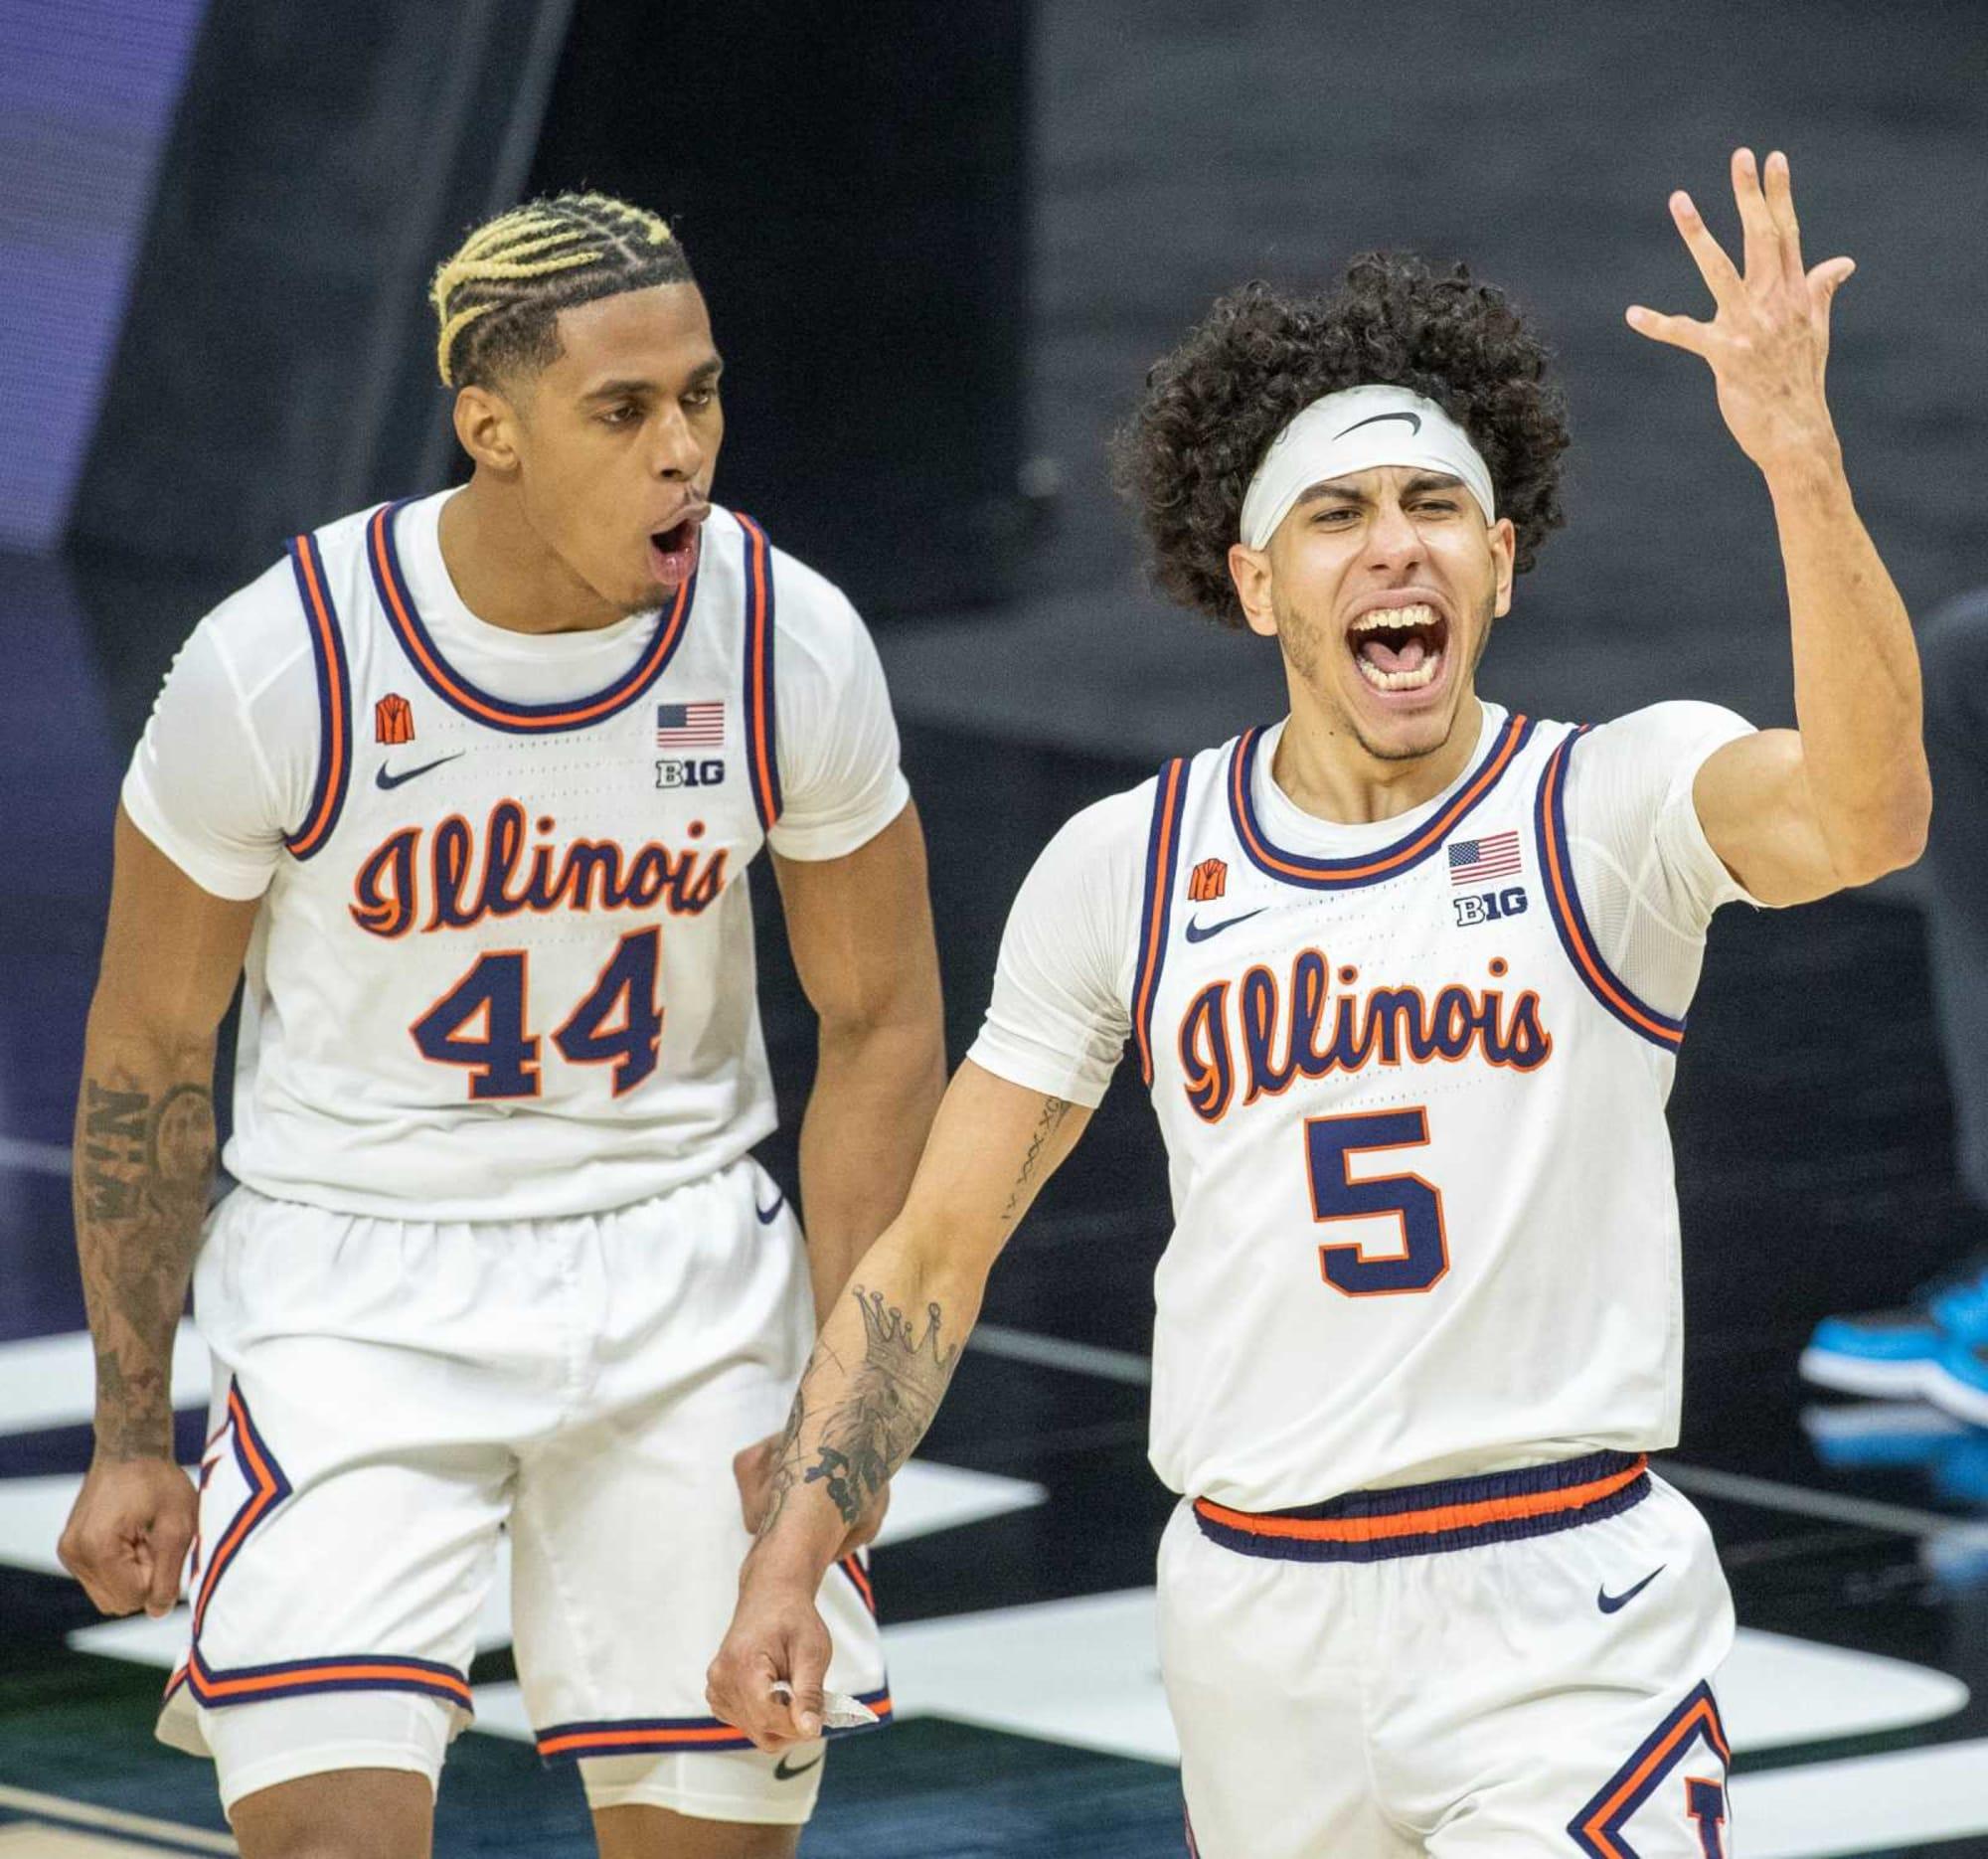 Illinois Basketball: Illini earn No. 1 seed in the 2021 NCAA tournament